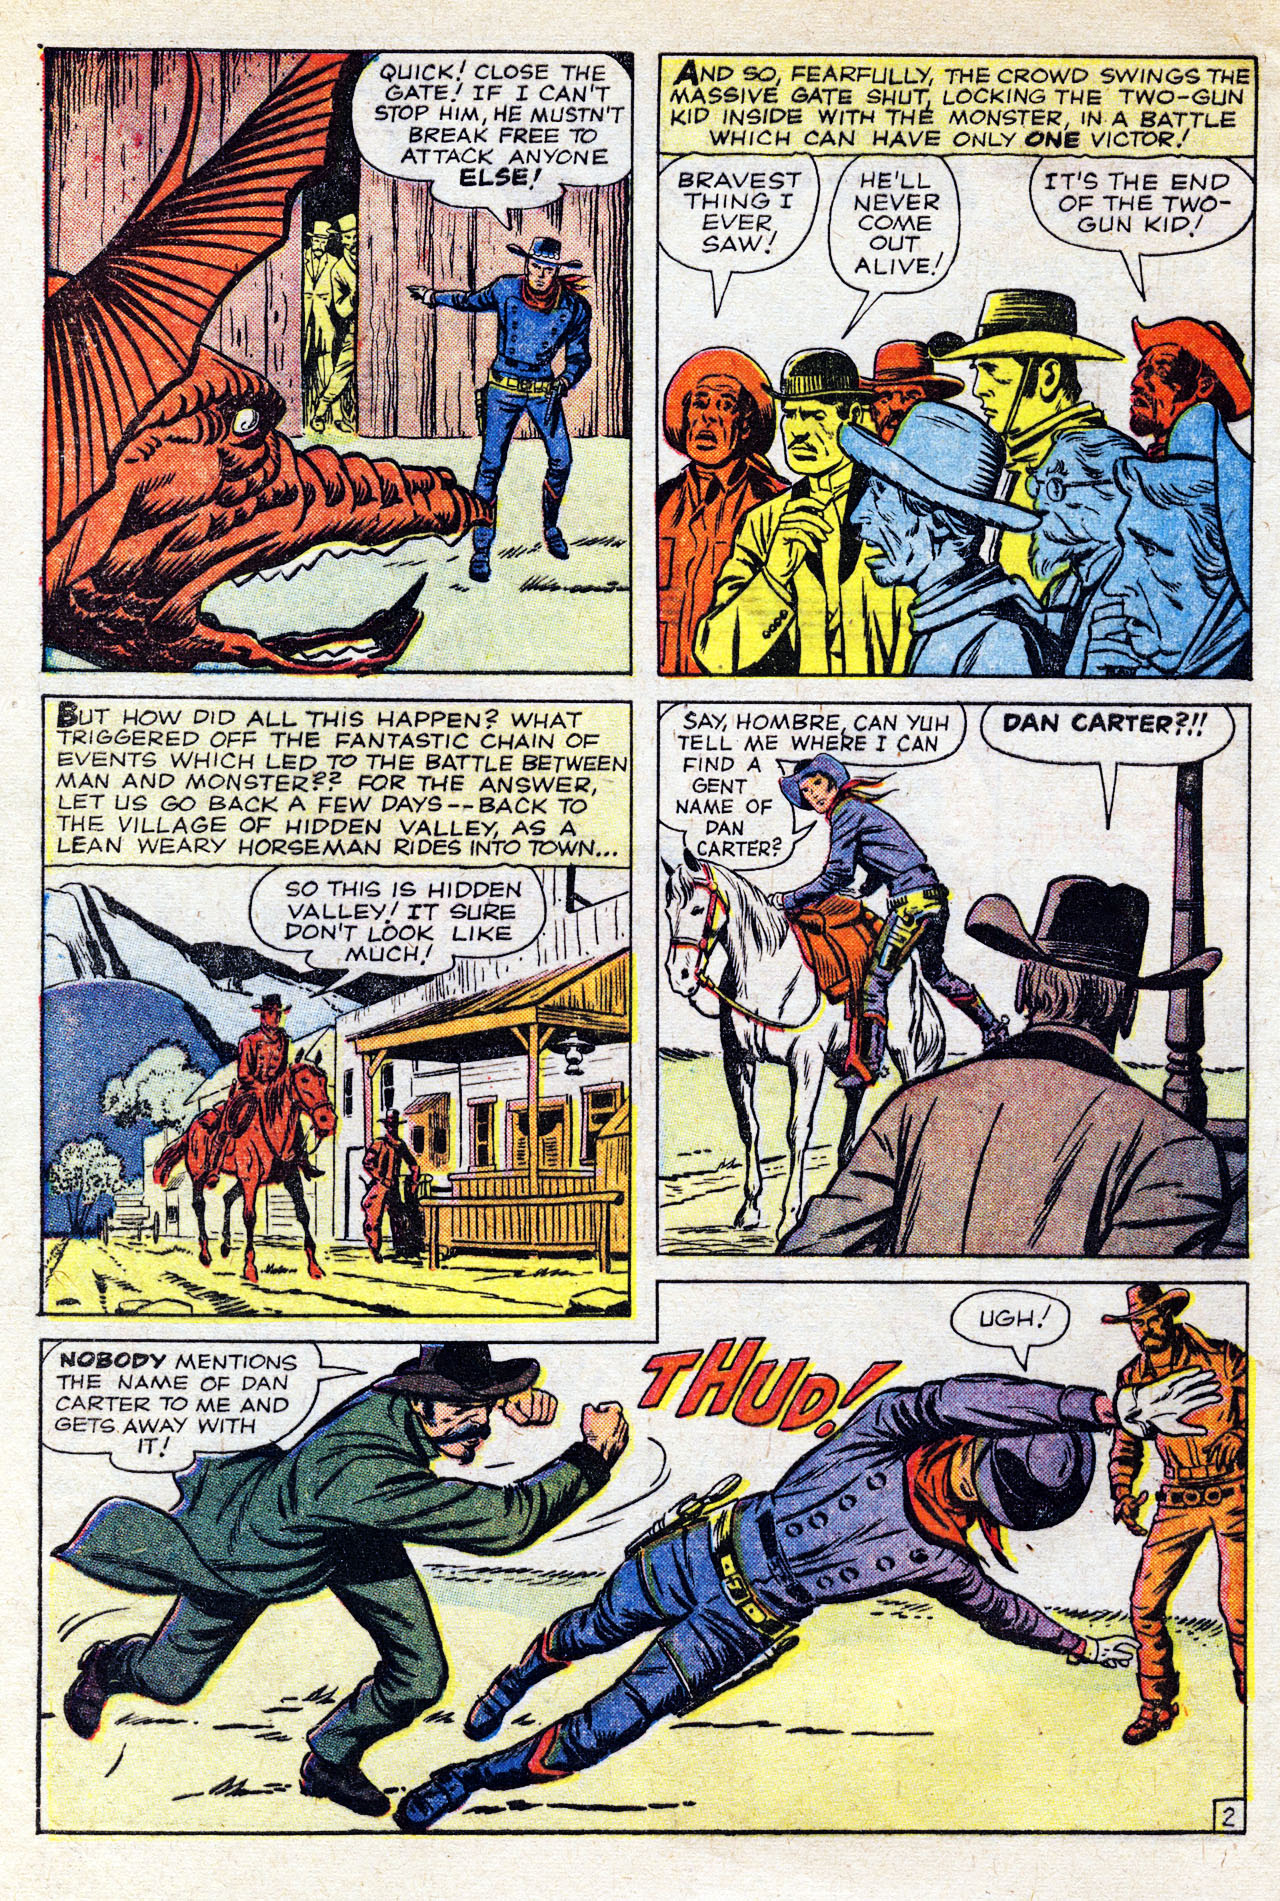 Read online Two-Gun Kid comic -  Issue #58 - 4